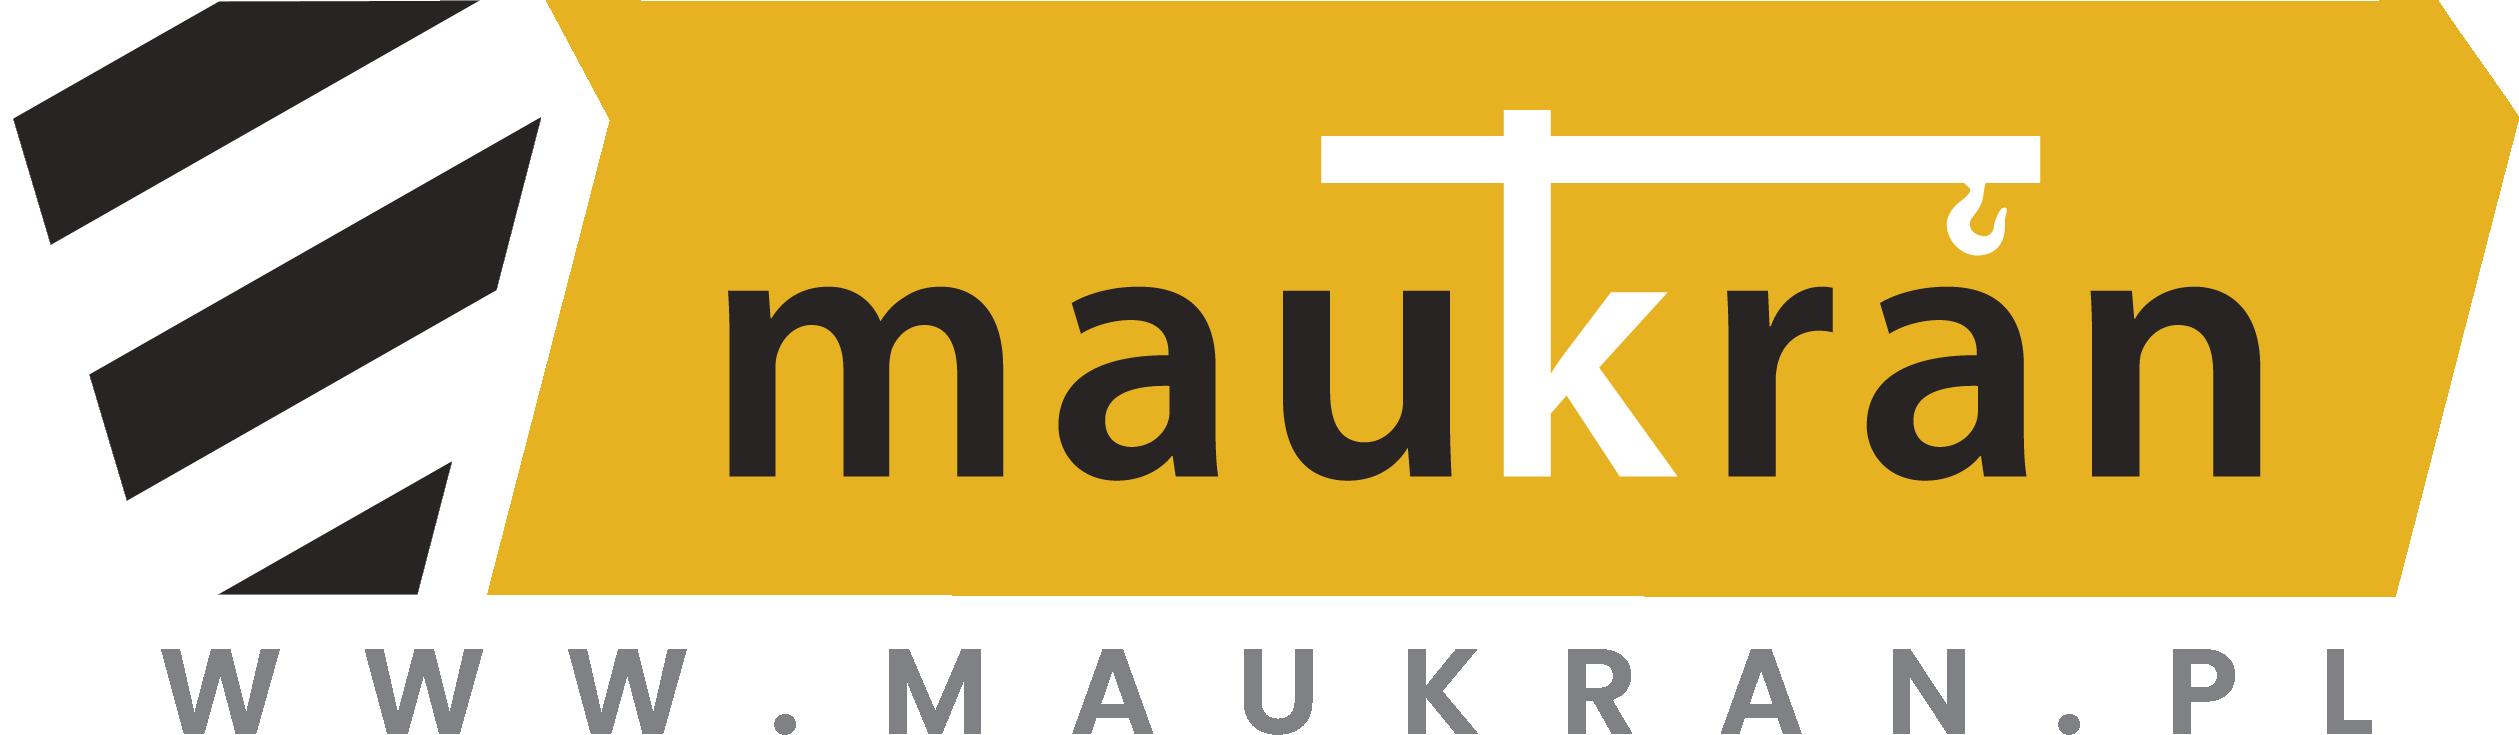 Maukran